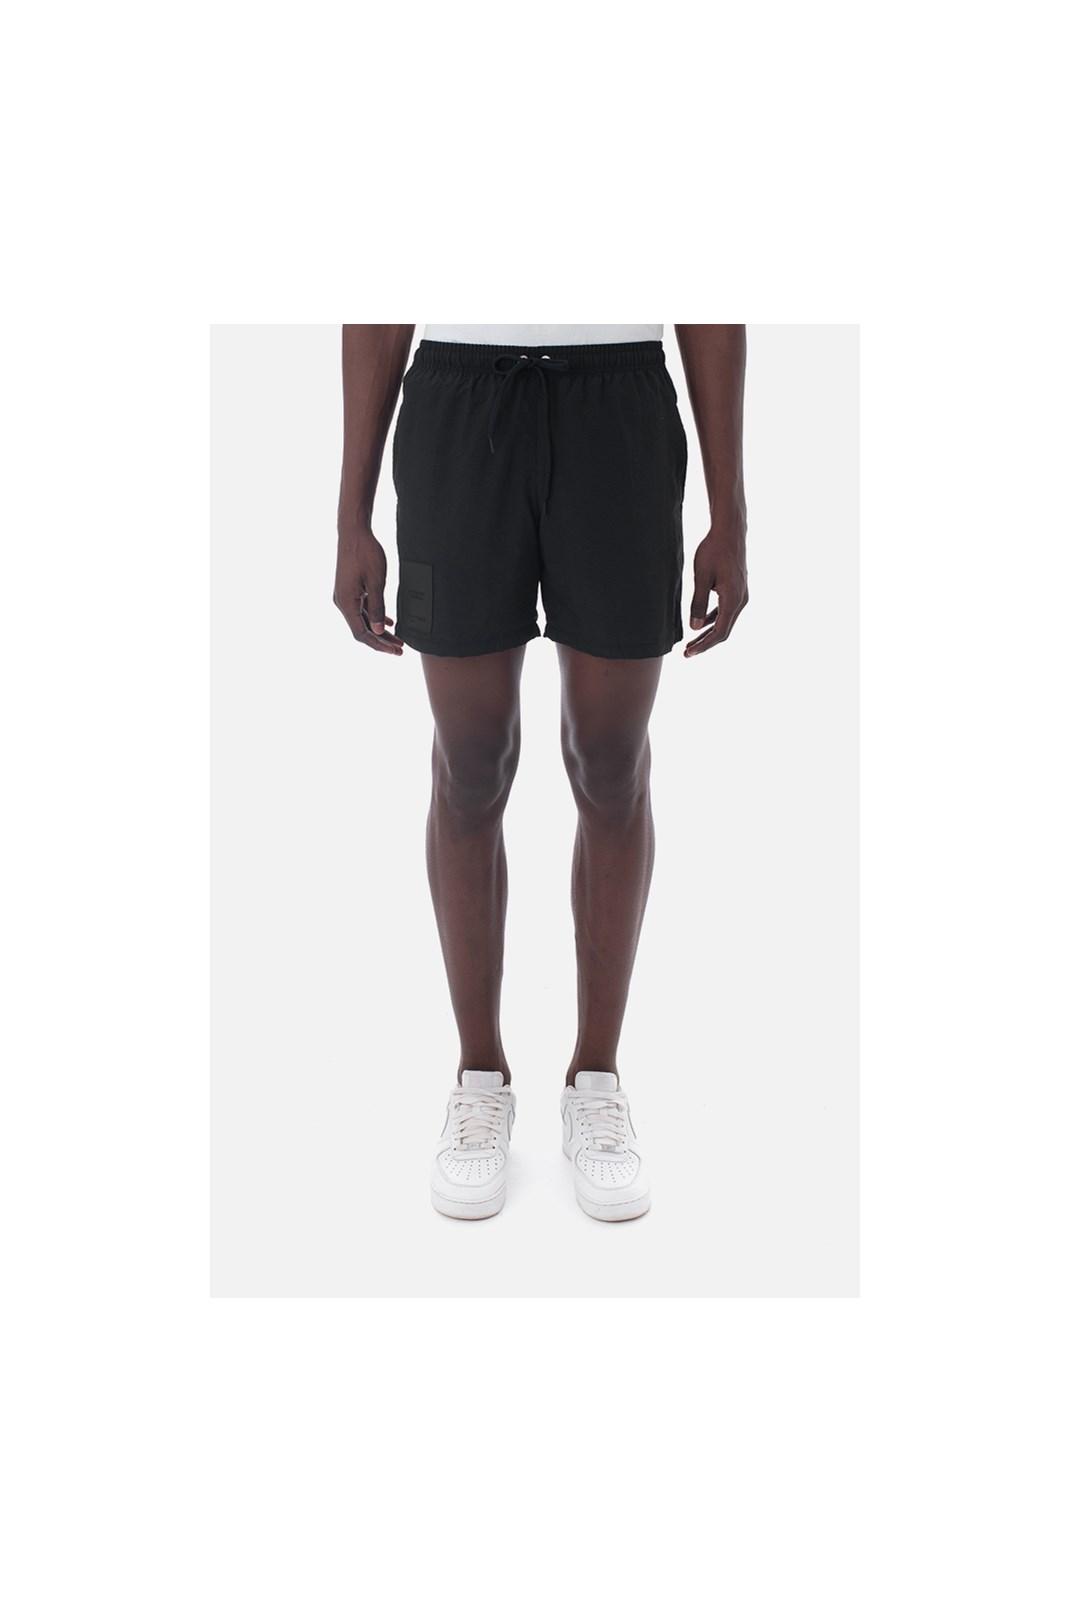 Shorts Approve Yrslf Preto